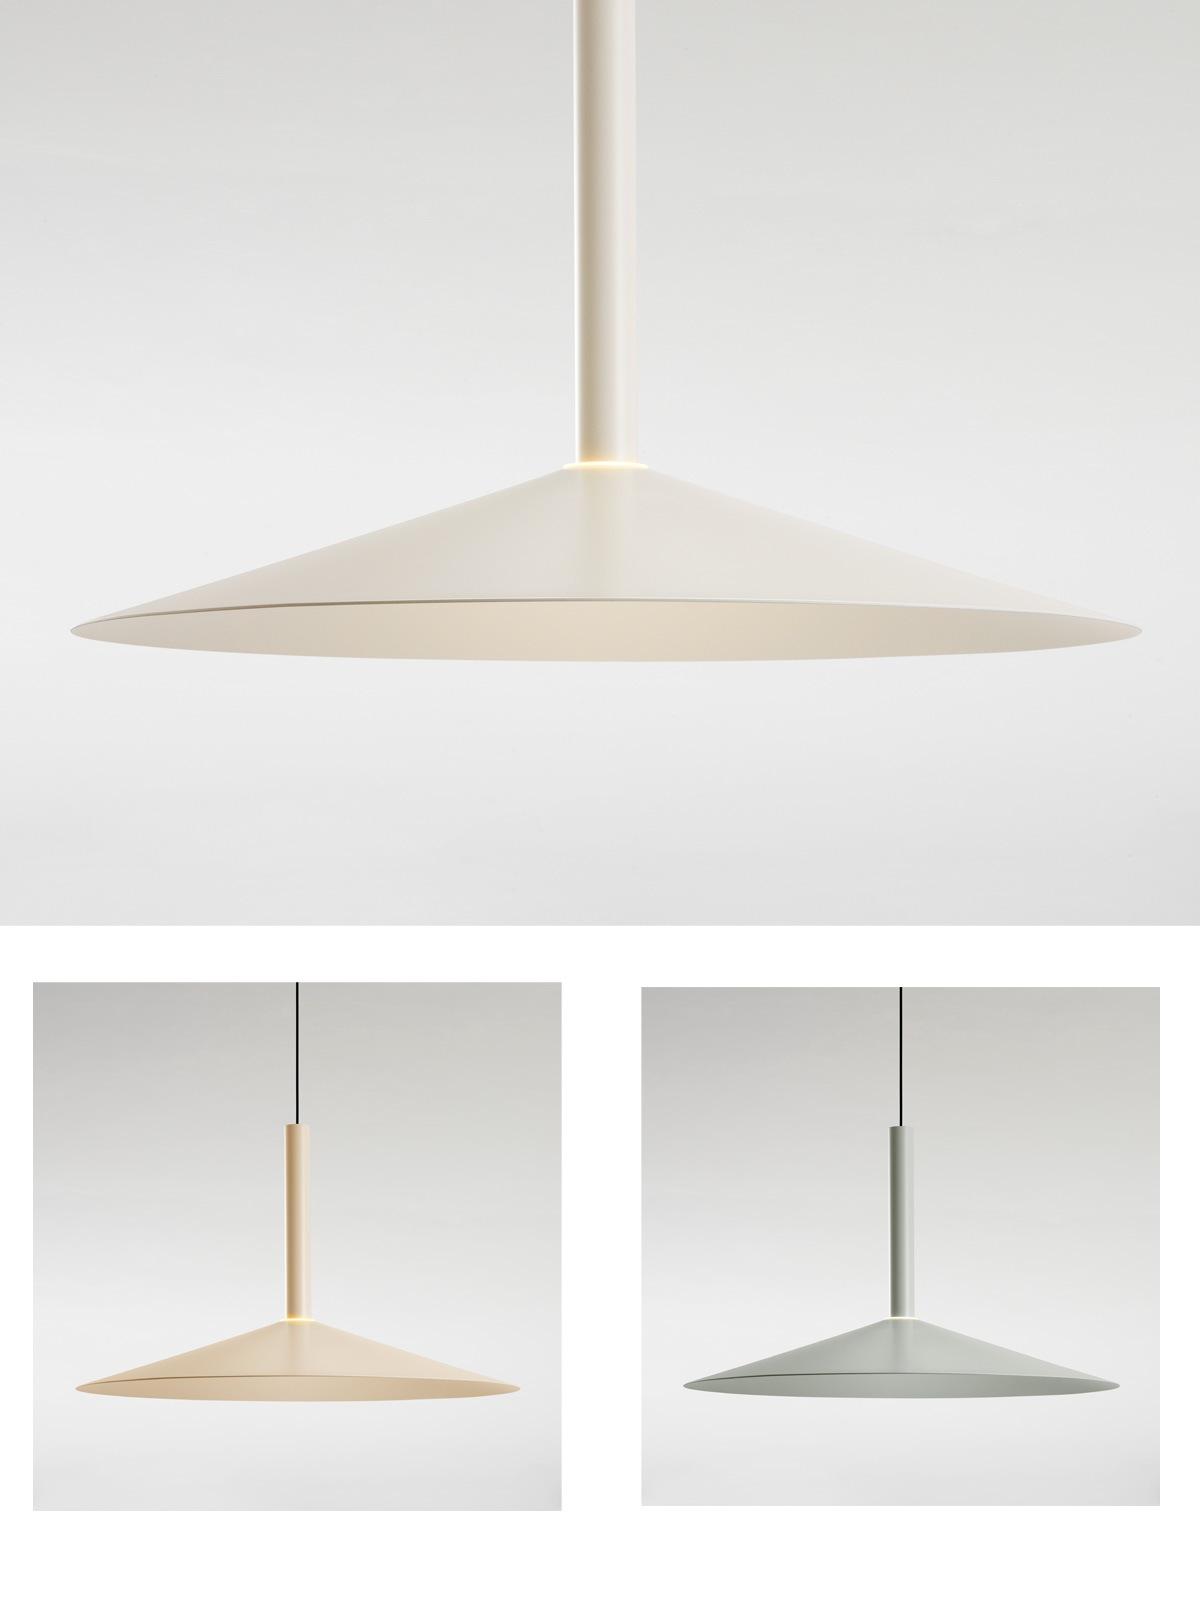 Milana Leuchte Marset DesignOrt Lampen Onlineshop Berlin